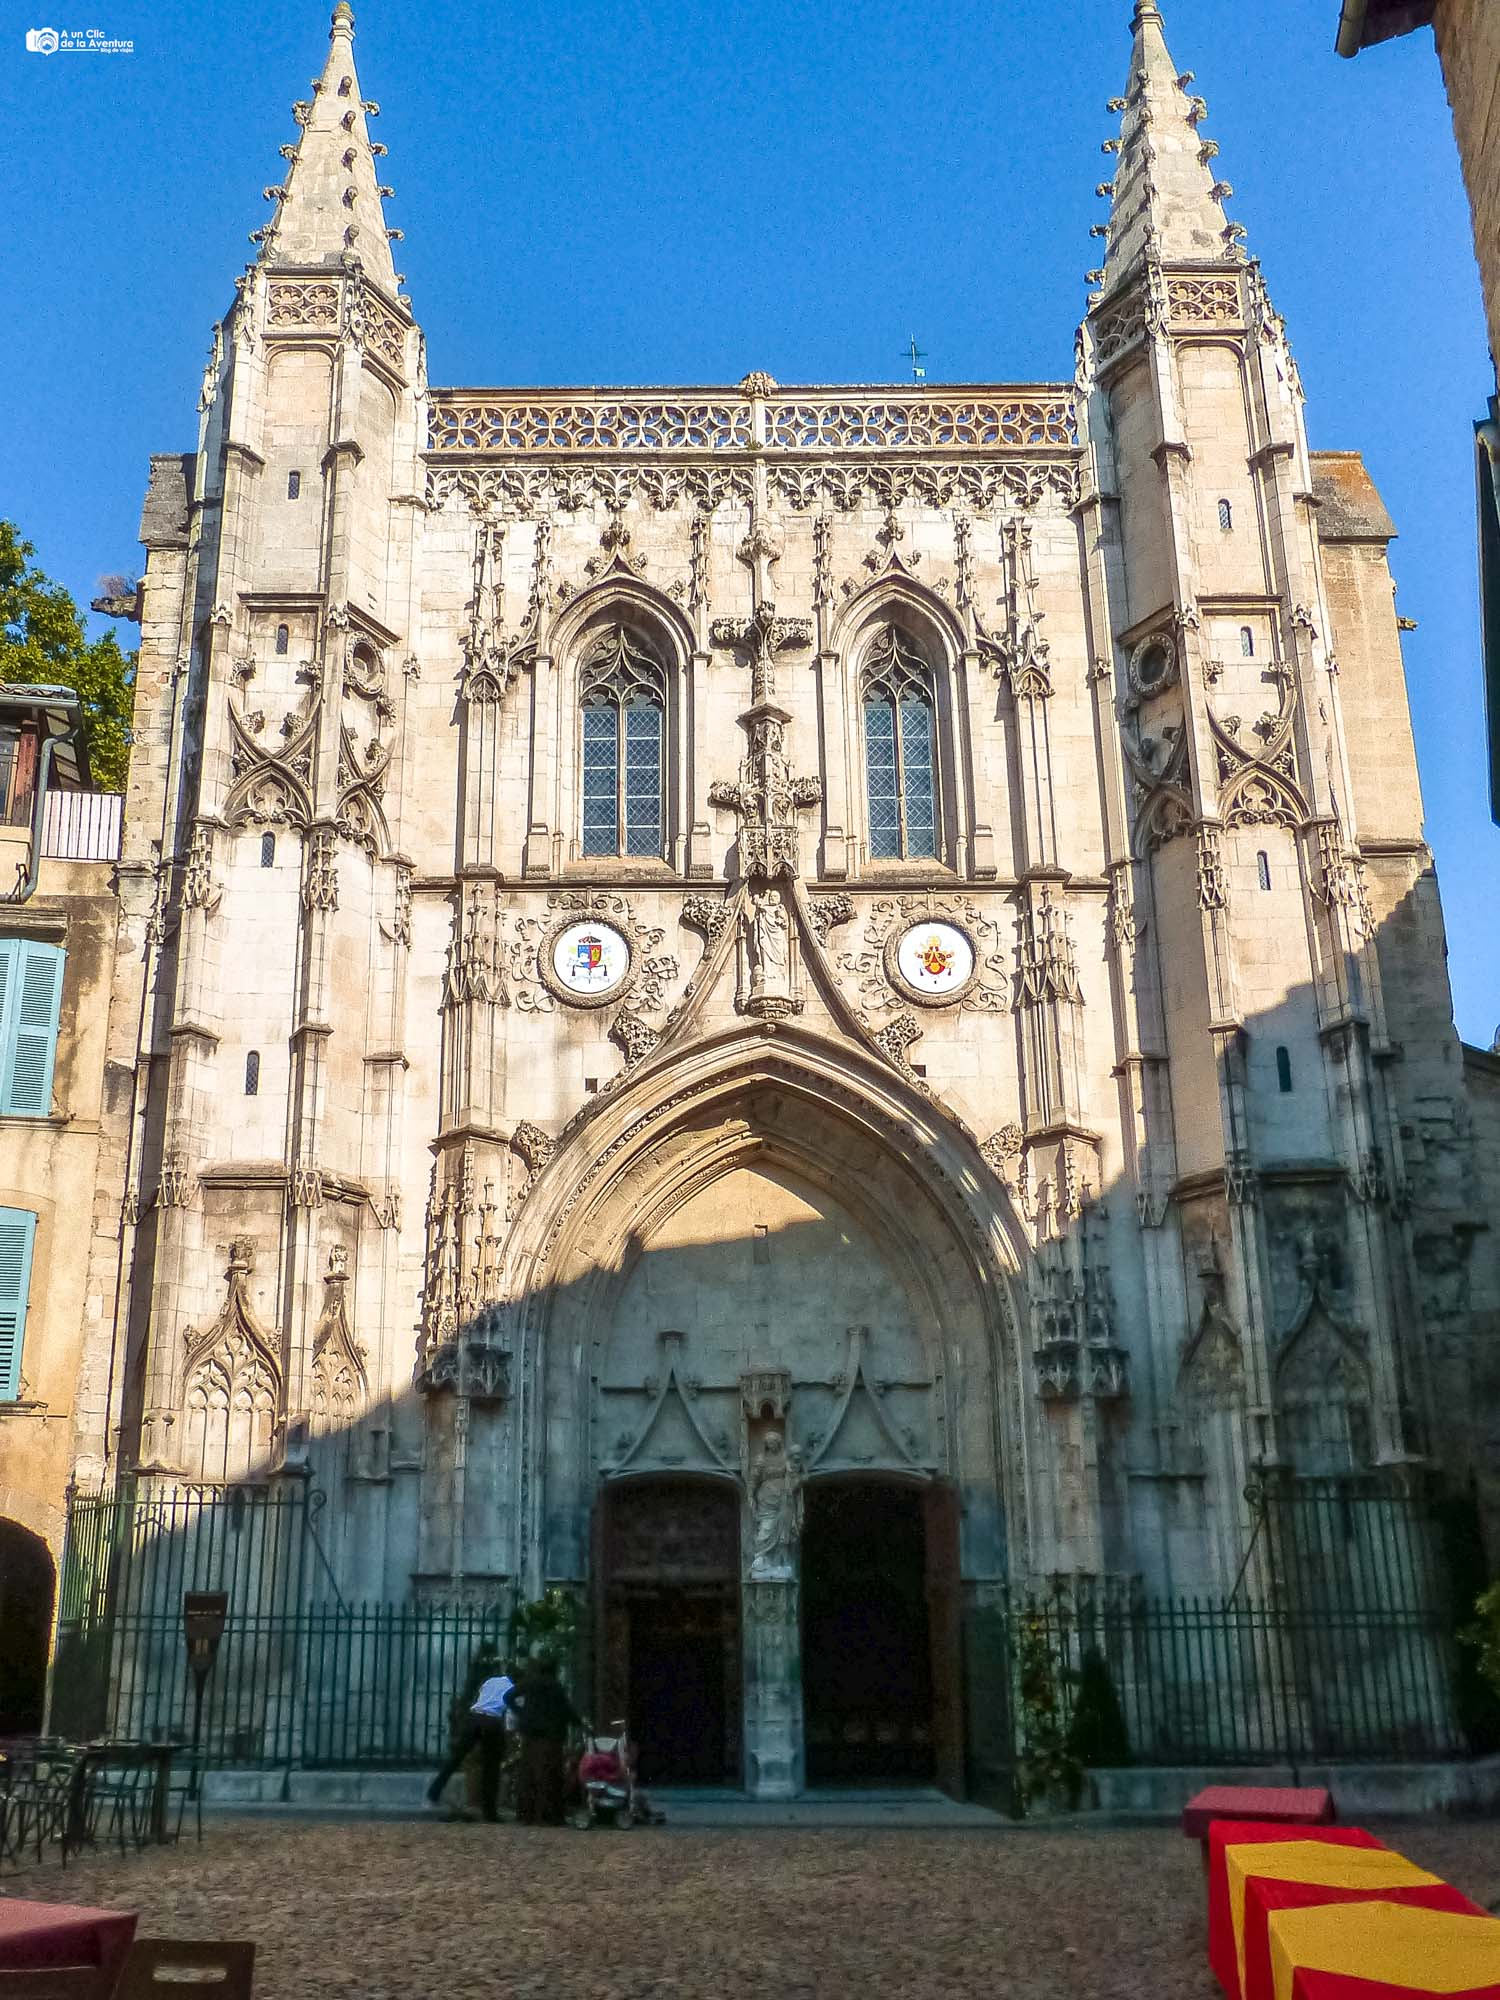 Fachada de la Basílica de San Pedro de Avignon